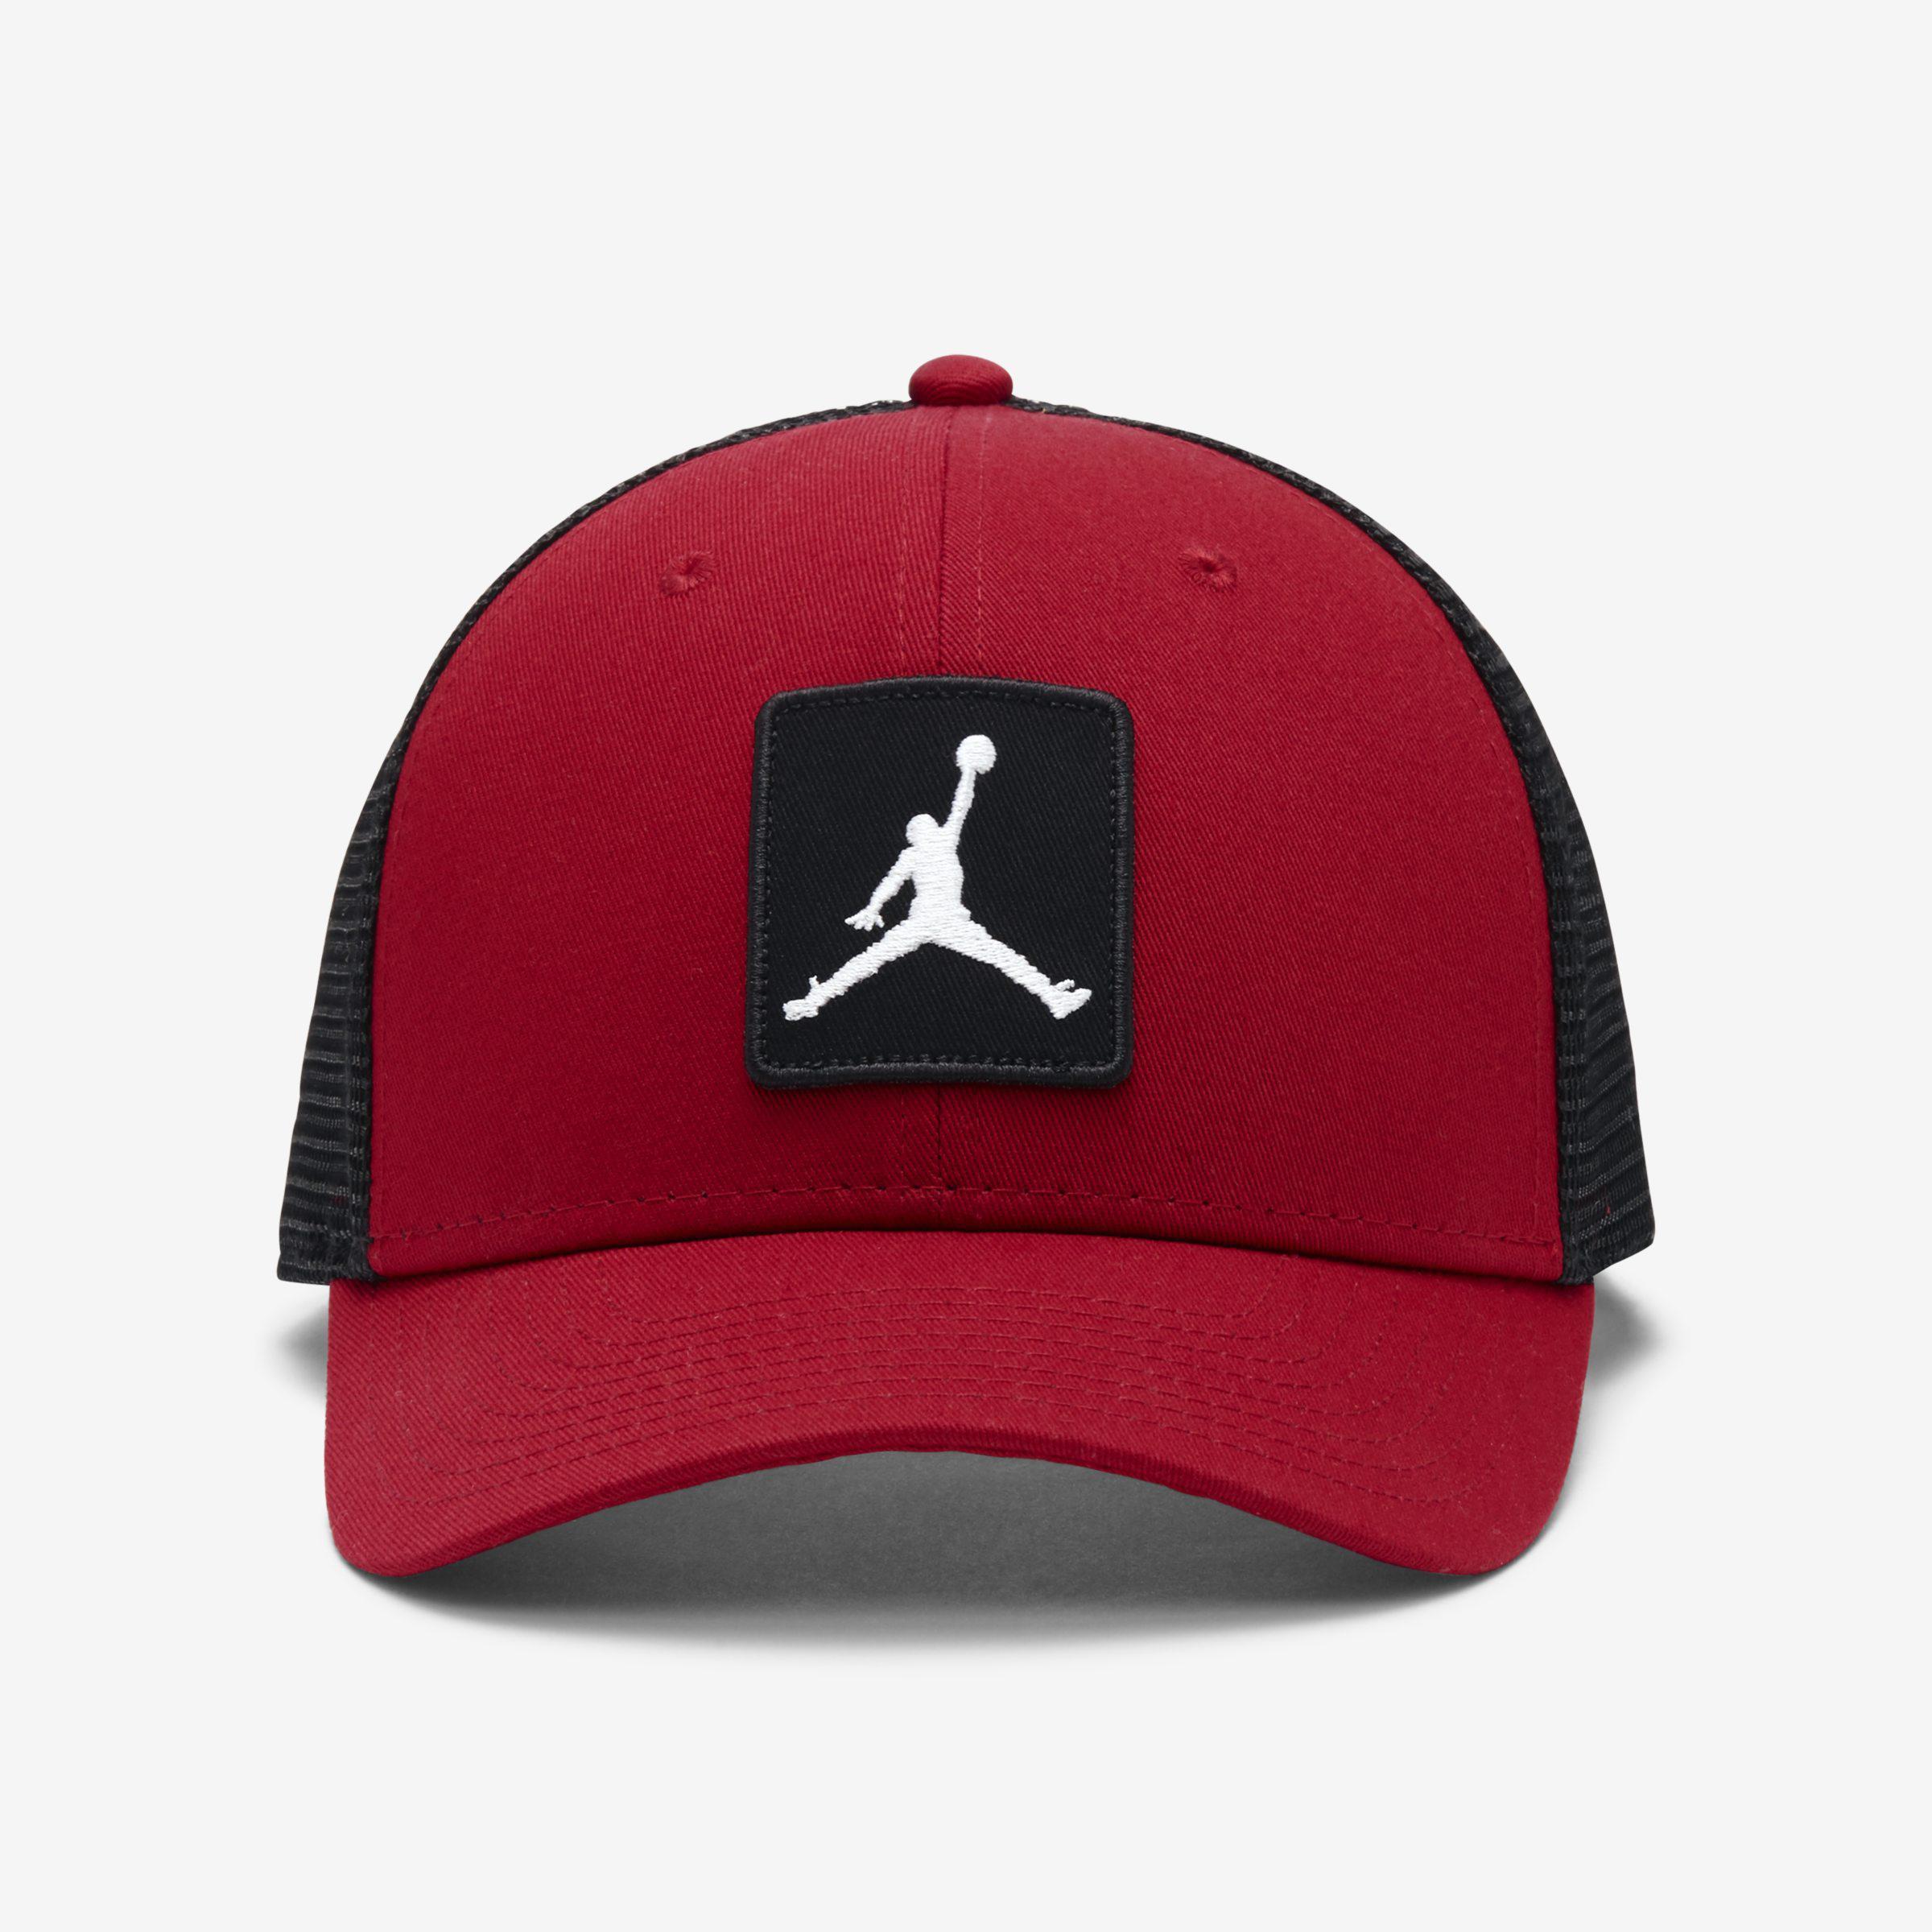 5e812f486433 Nike Jordan Jumpman Classic99 Trucker Adjustable Hat in Red for Men ...